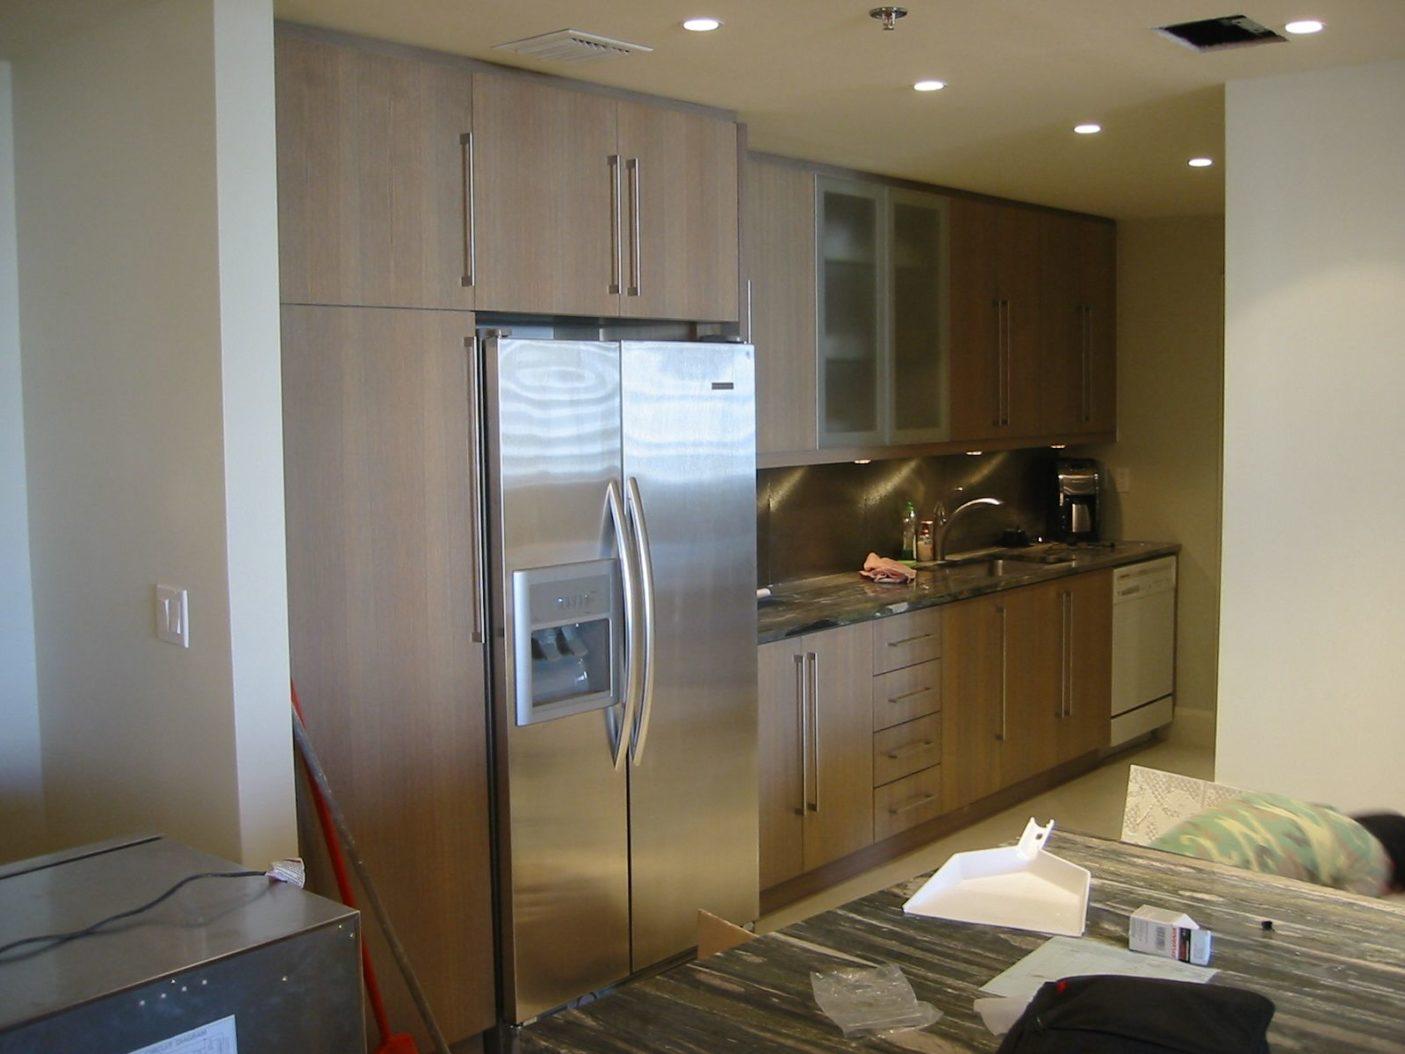 Kitchens-180.jpg